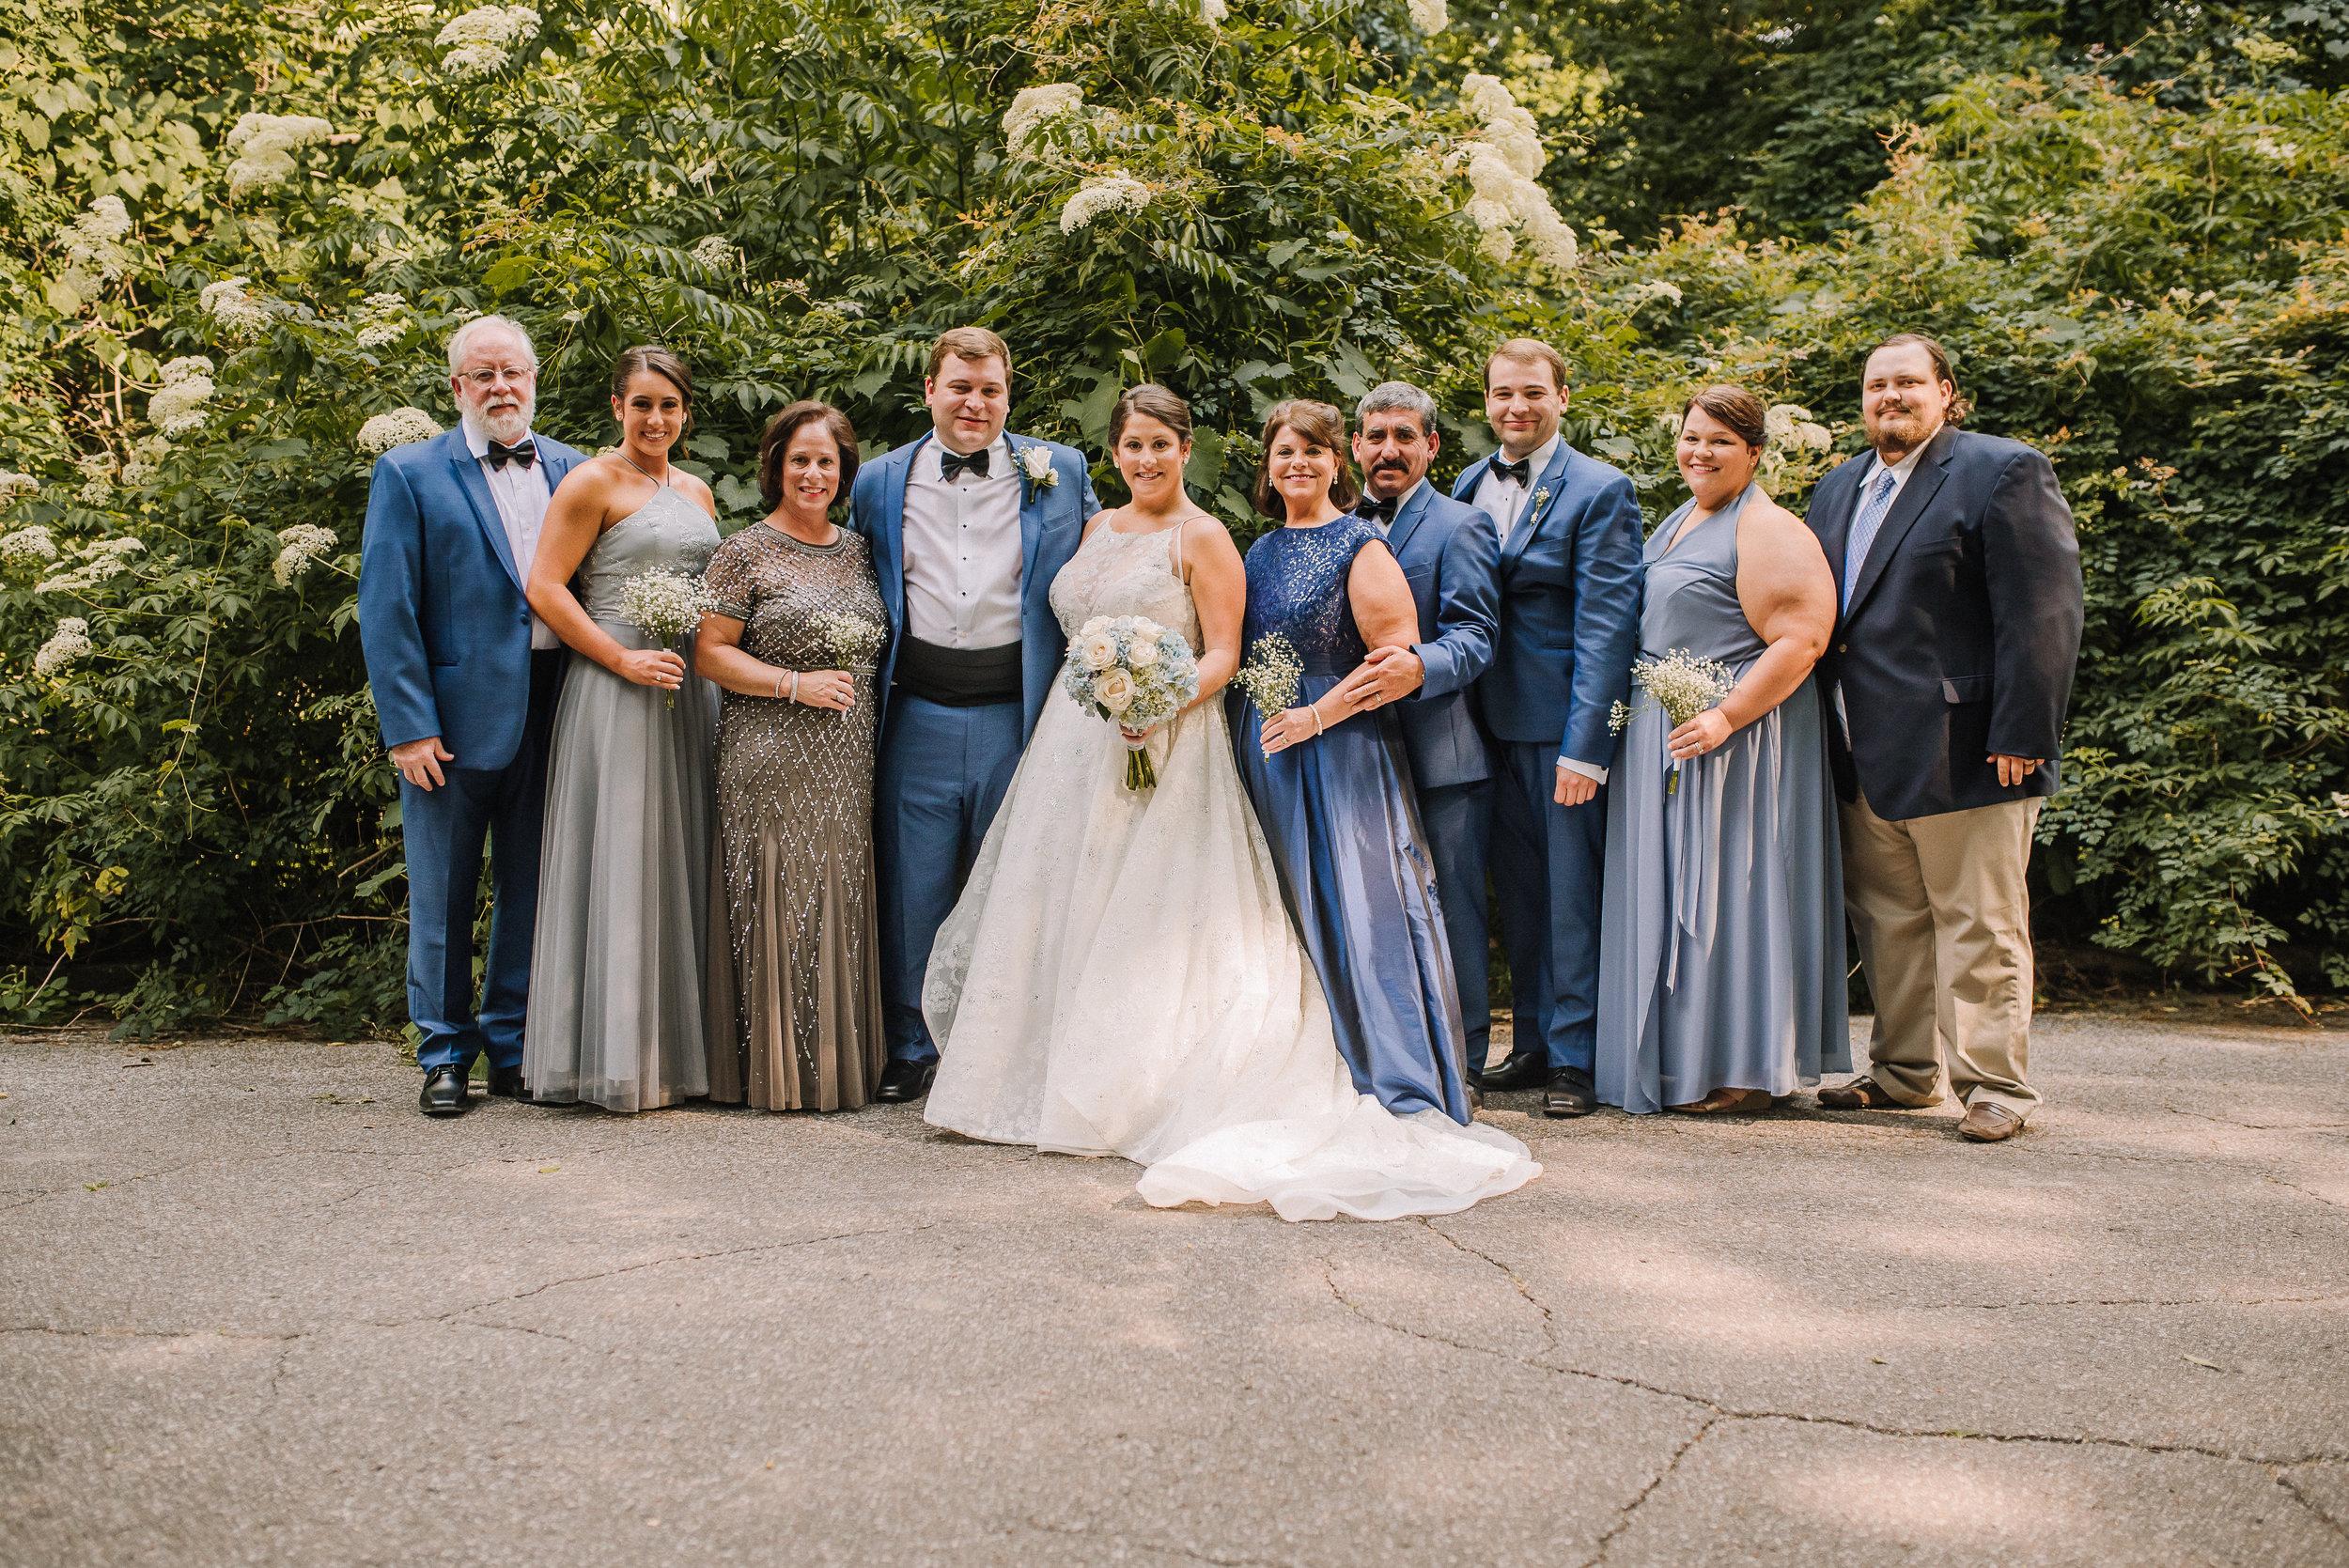 Smith Wedding_Memphis Zoo_Ashley Benham Photography-284.jpg